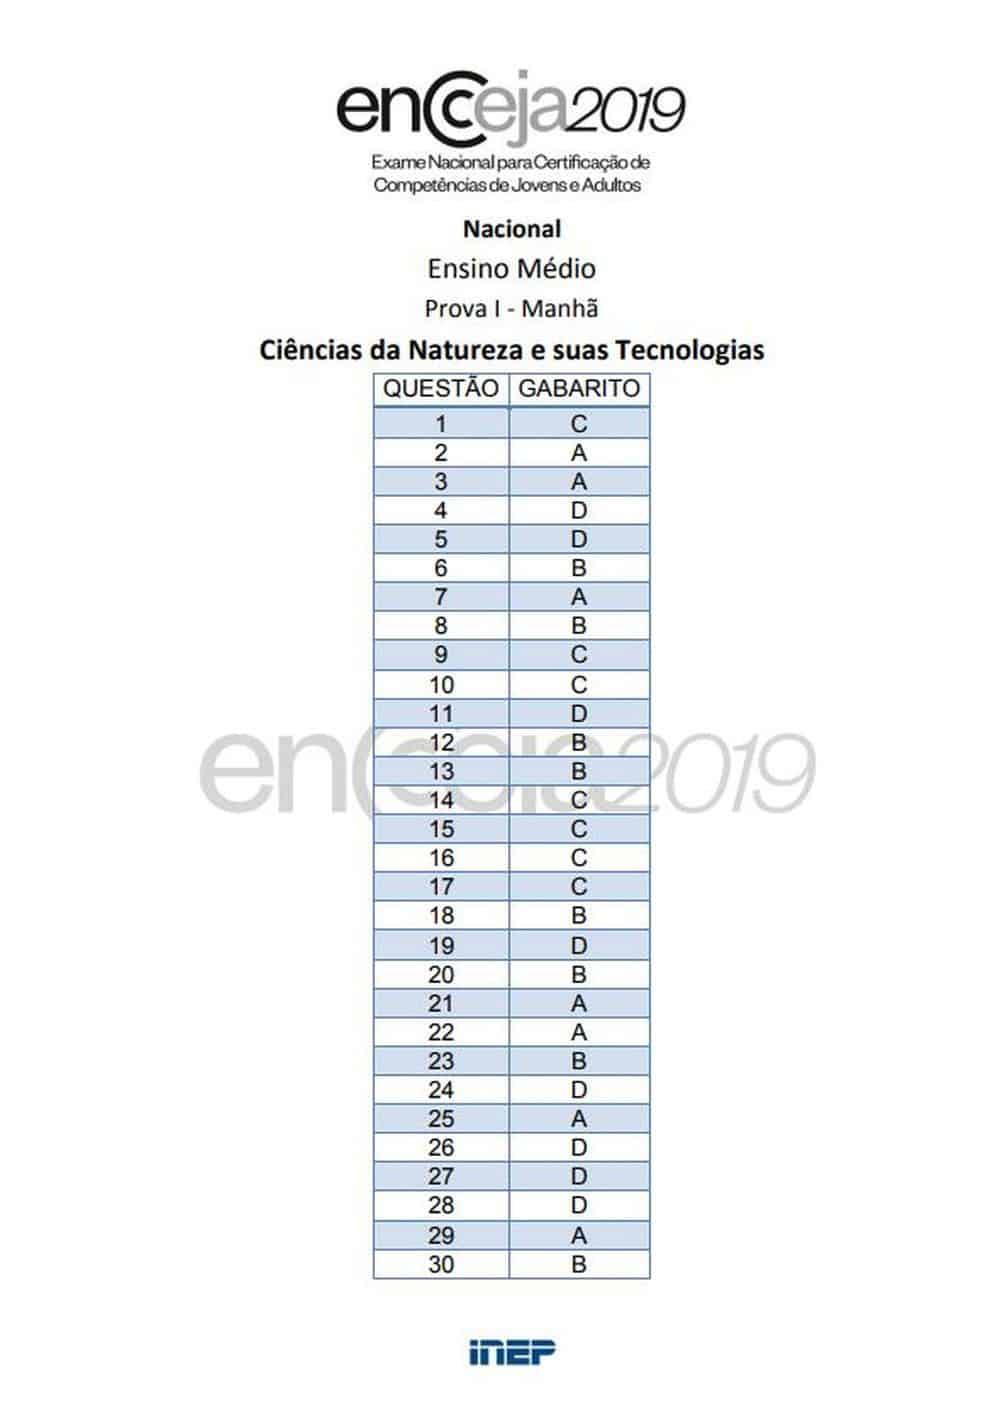 Gabarito Encceja 2019 Ensino Médio 1